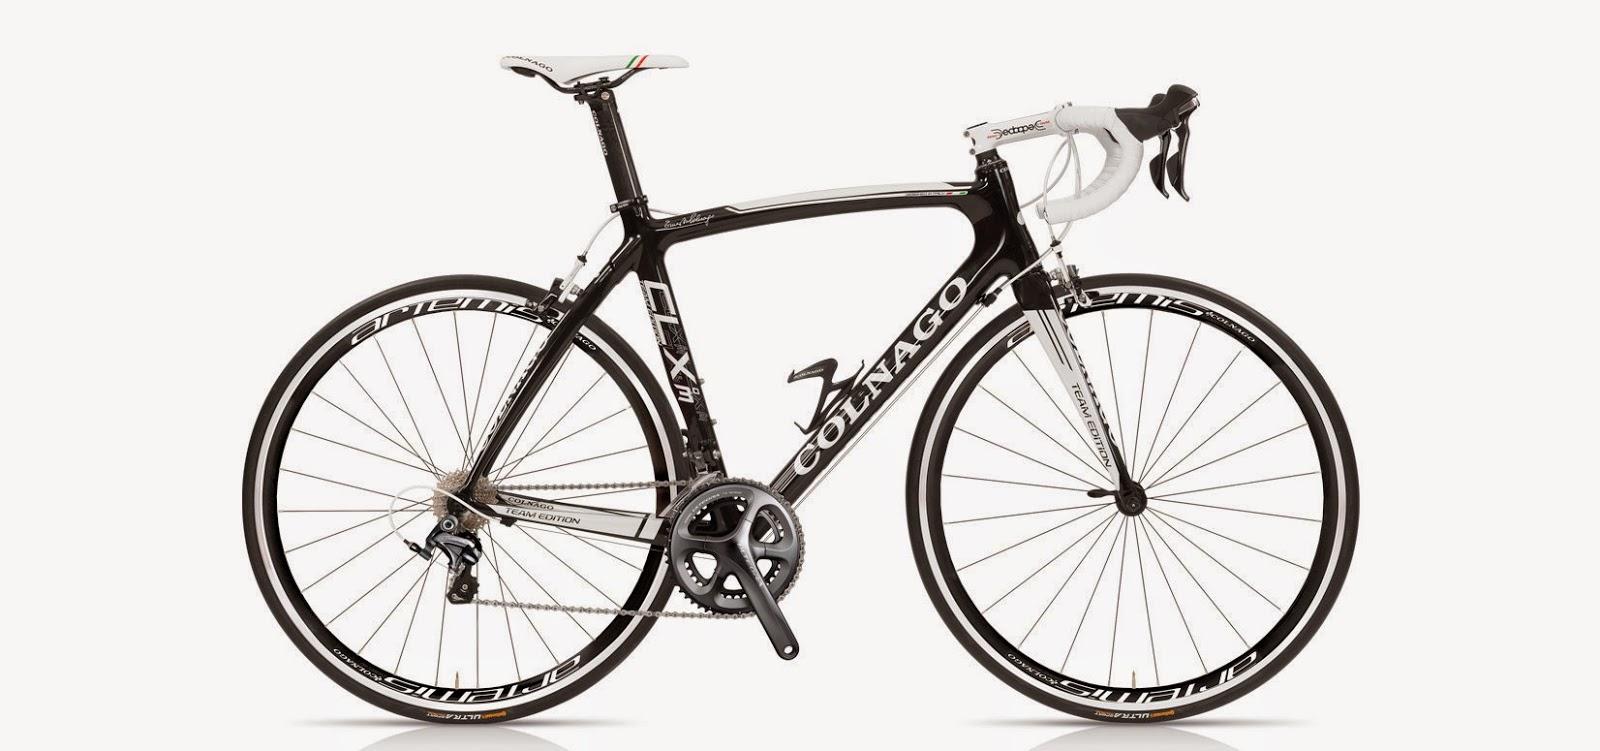 Colnago CLX 3.0 105 2014 Road Bike.Harga: Rp. 22.000.000. - SARANA ...